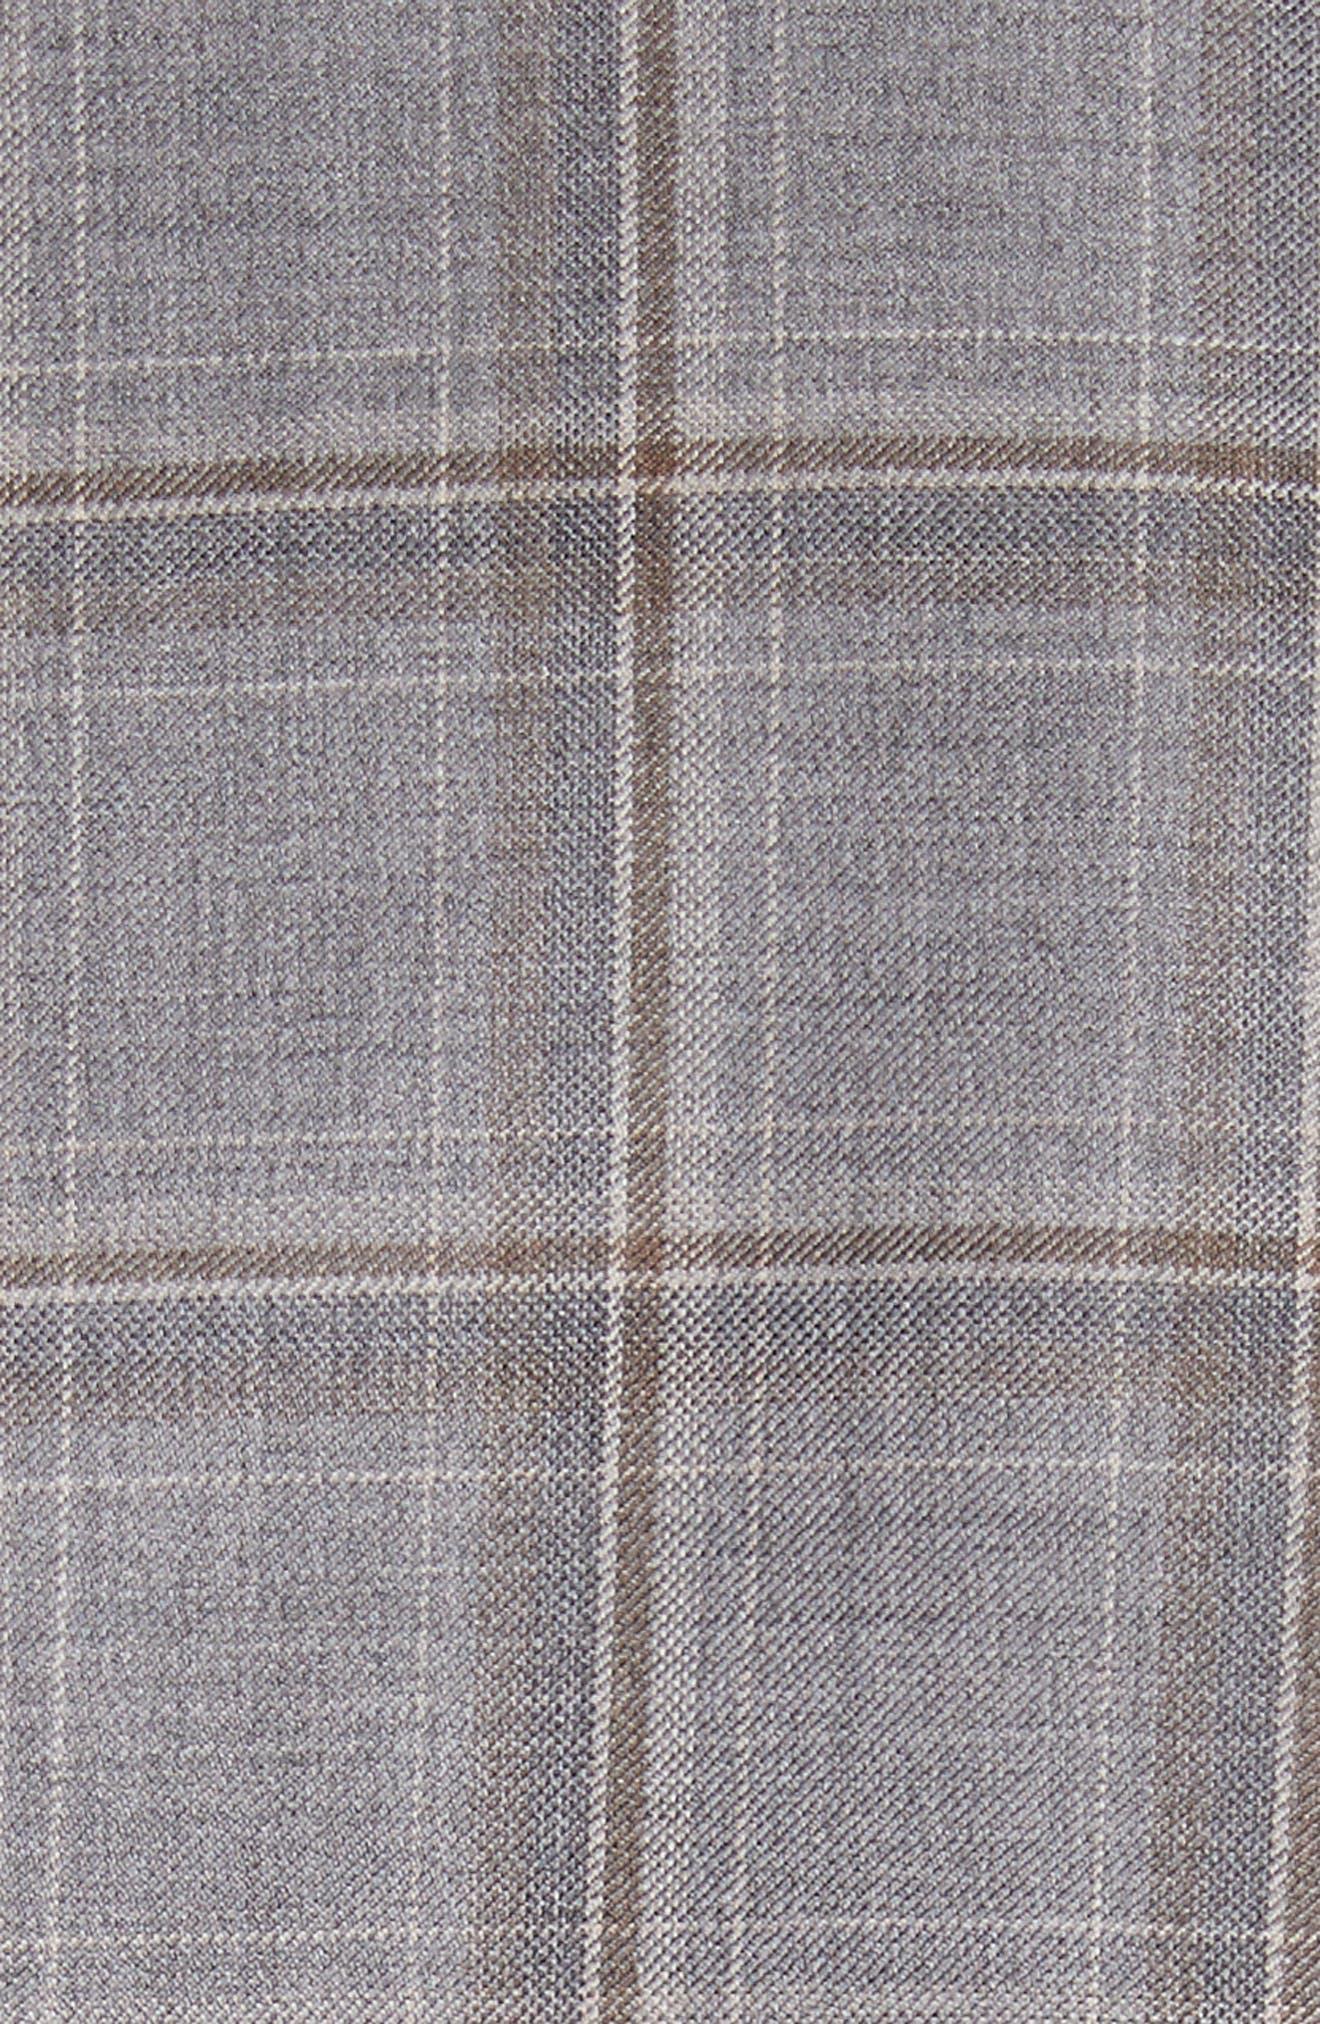 Classic Fit Plaid Wool Sport Coat,                             Alternate thumbnail 5, color,                             250